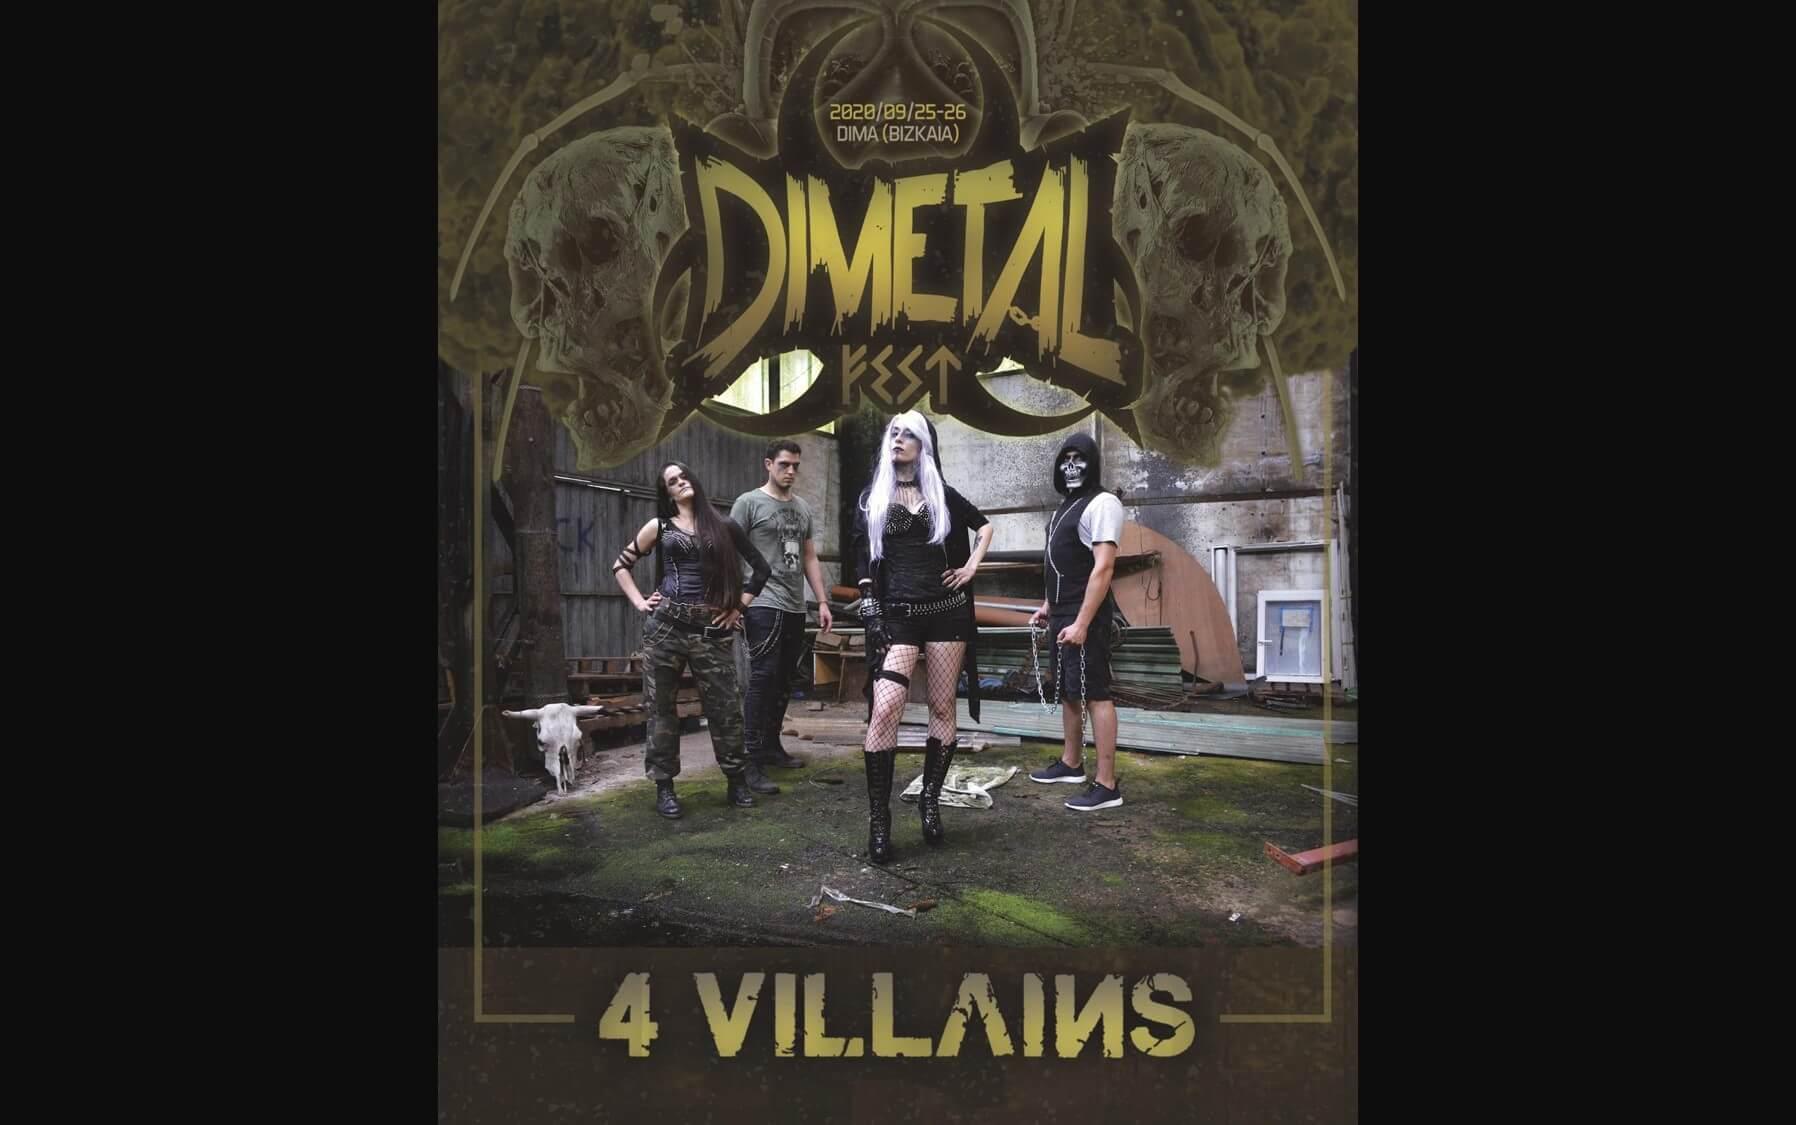 4Villains Confirmados para el Dimetal! 9